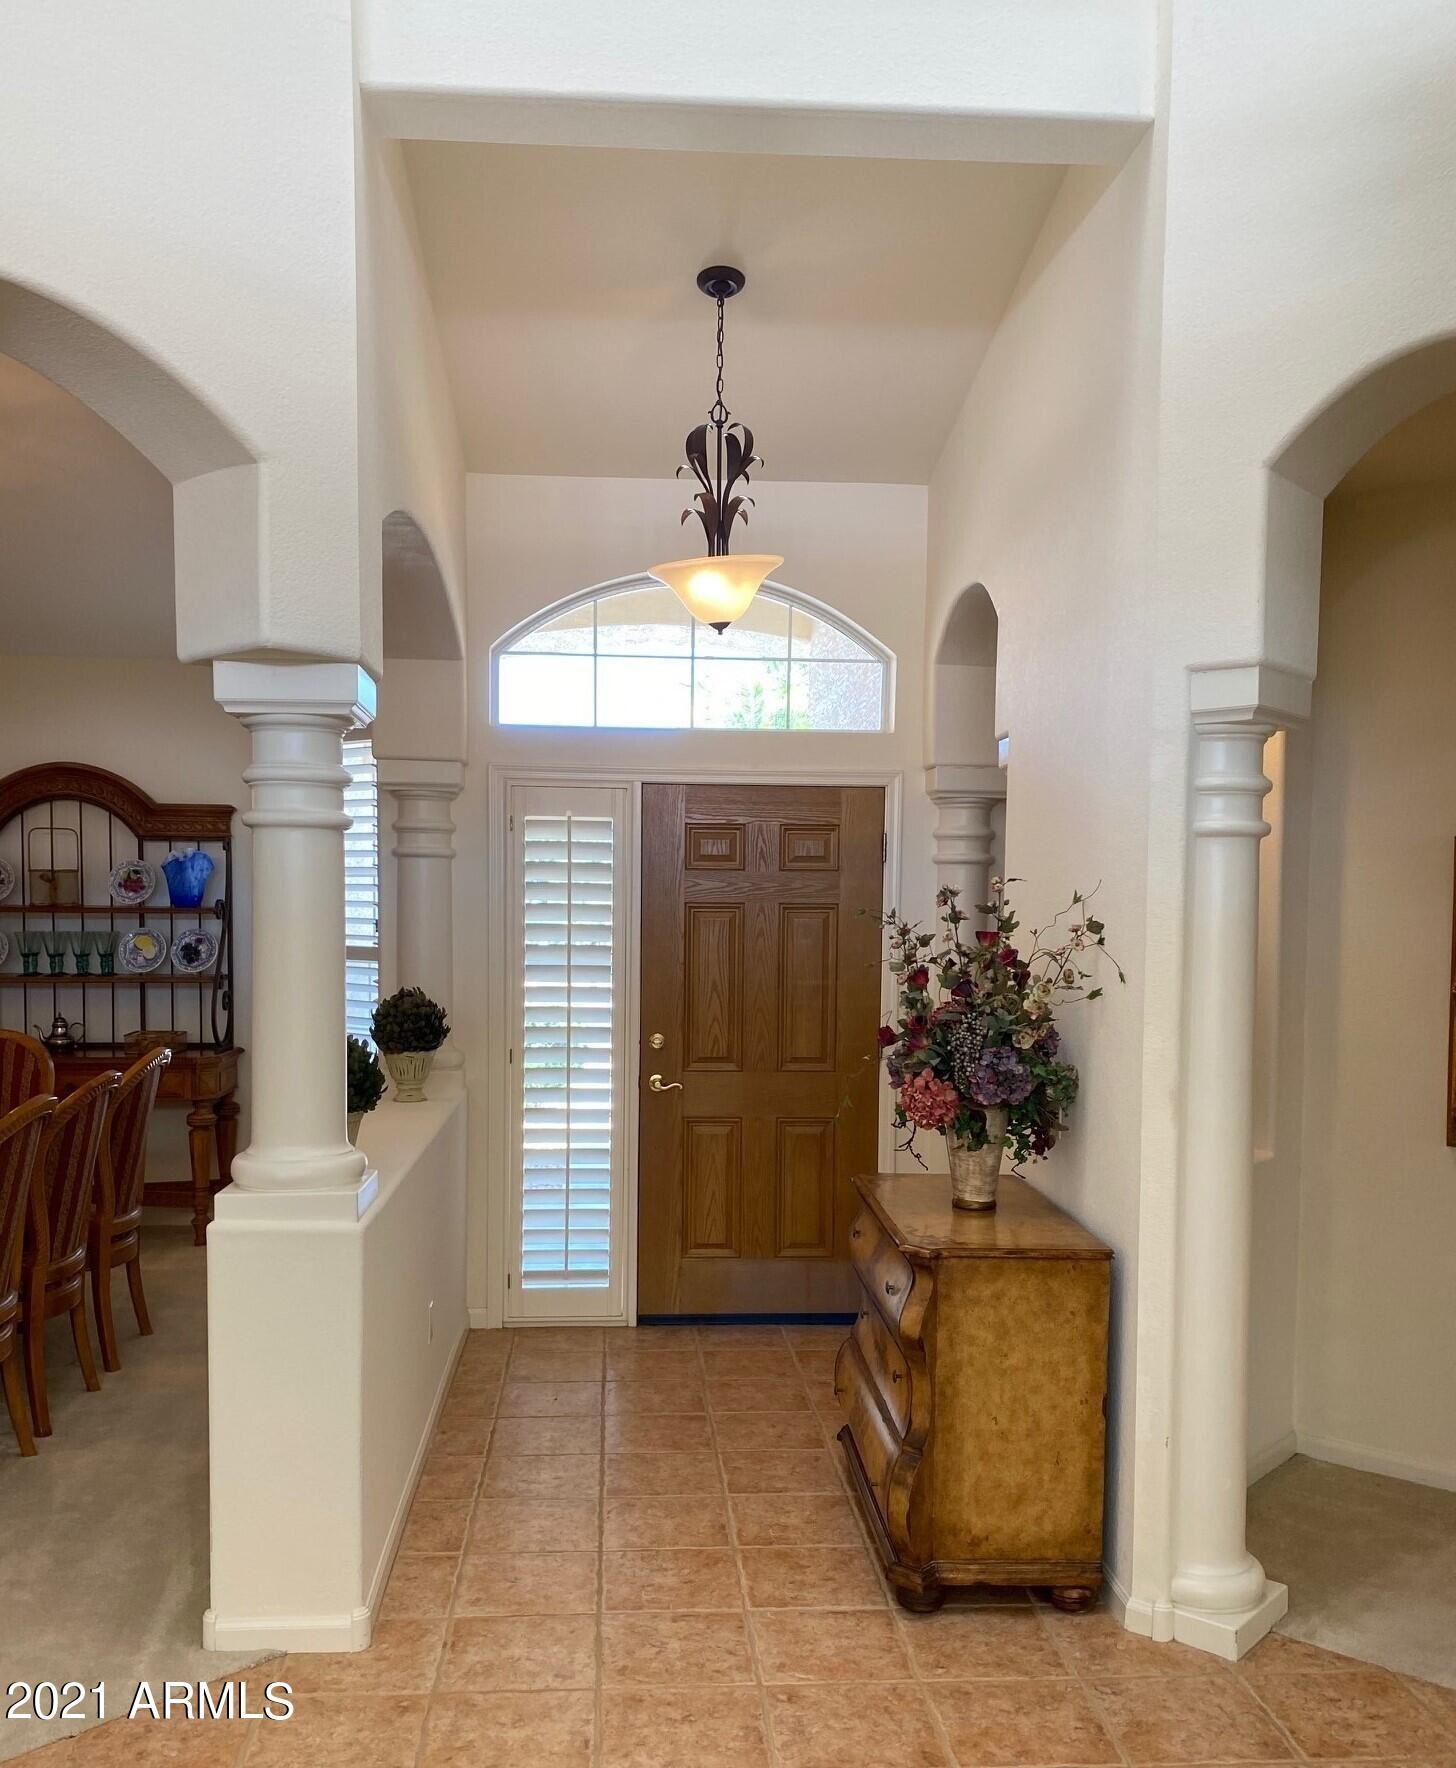 Photo of 15419 W FAIRMOUNT Avenue, Goodyear, AZ 85395 (MLS # 6249712)